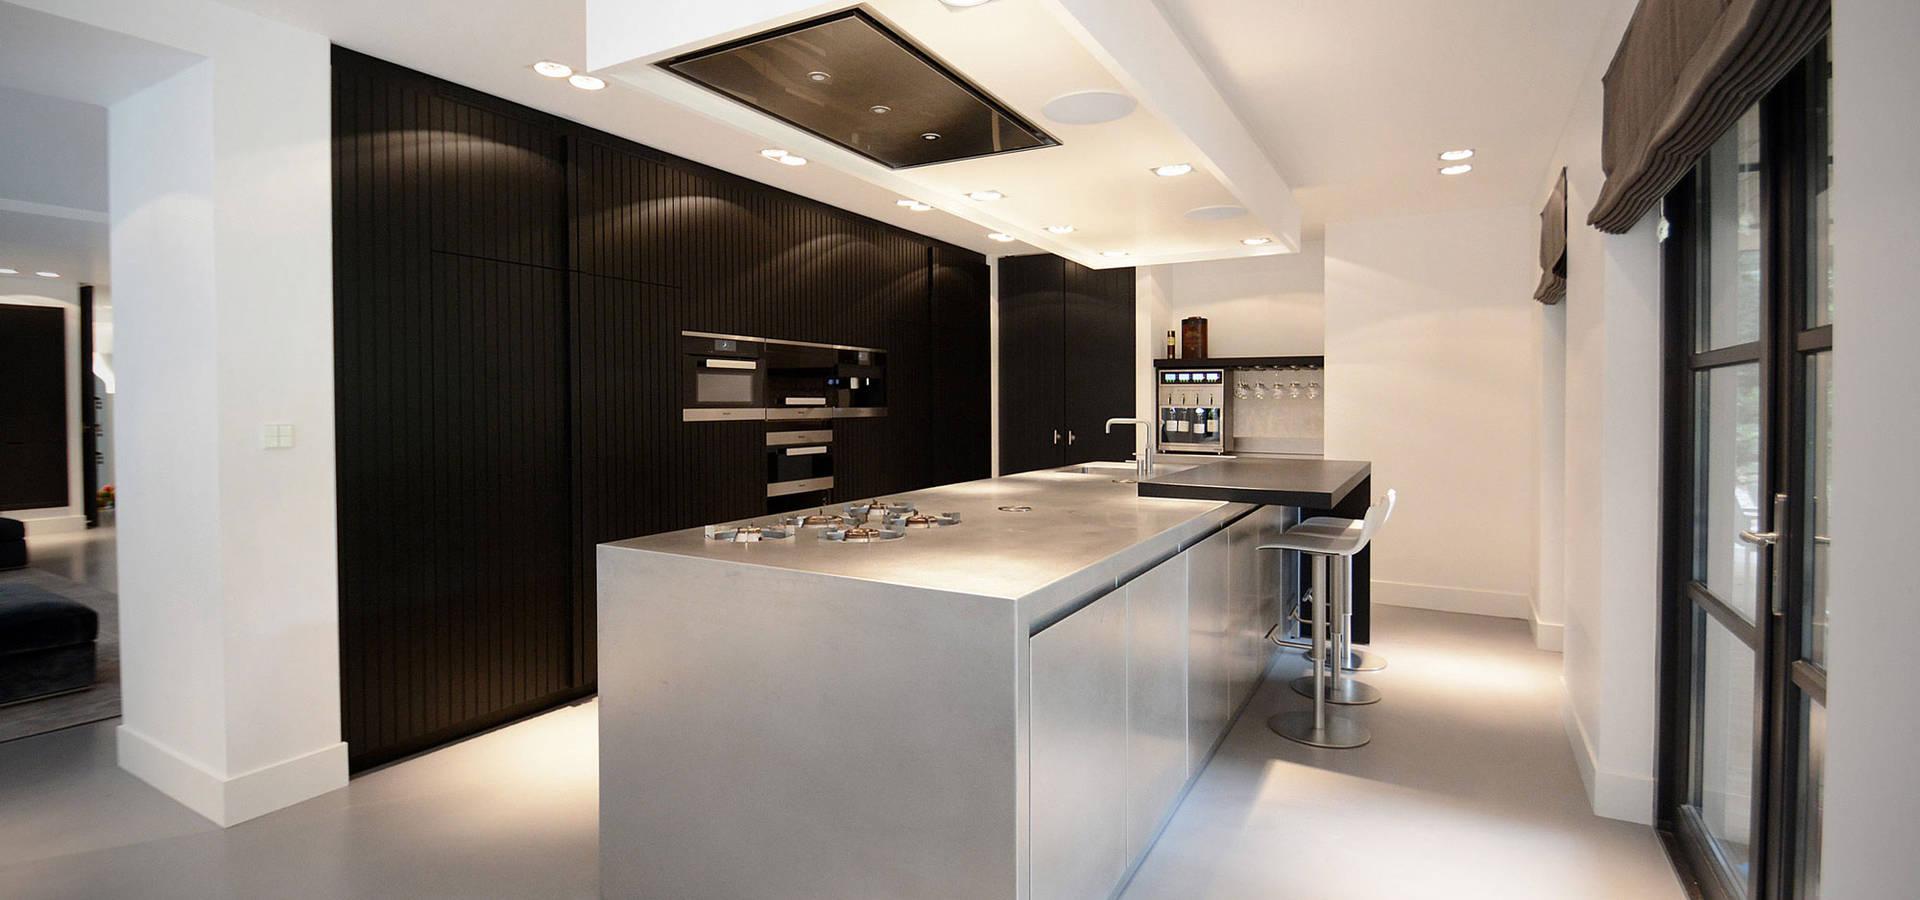 Keuken oss door ecker keukens en interieur homify for Keuken interieur